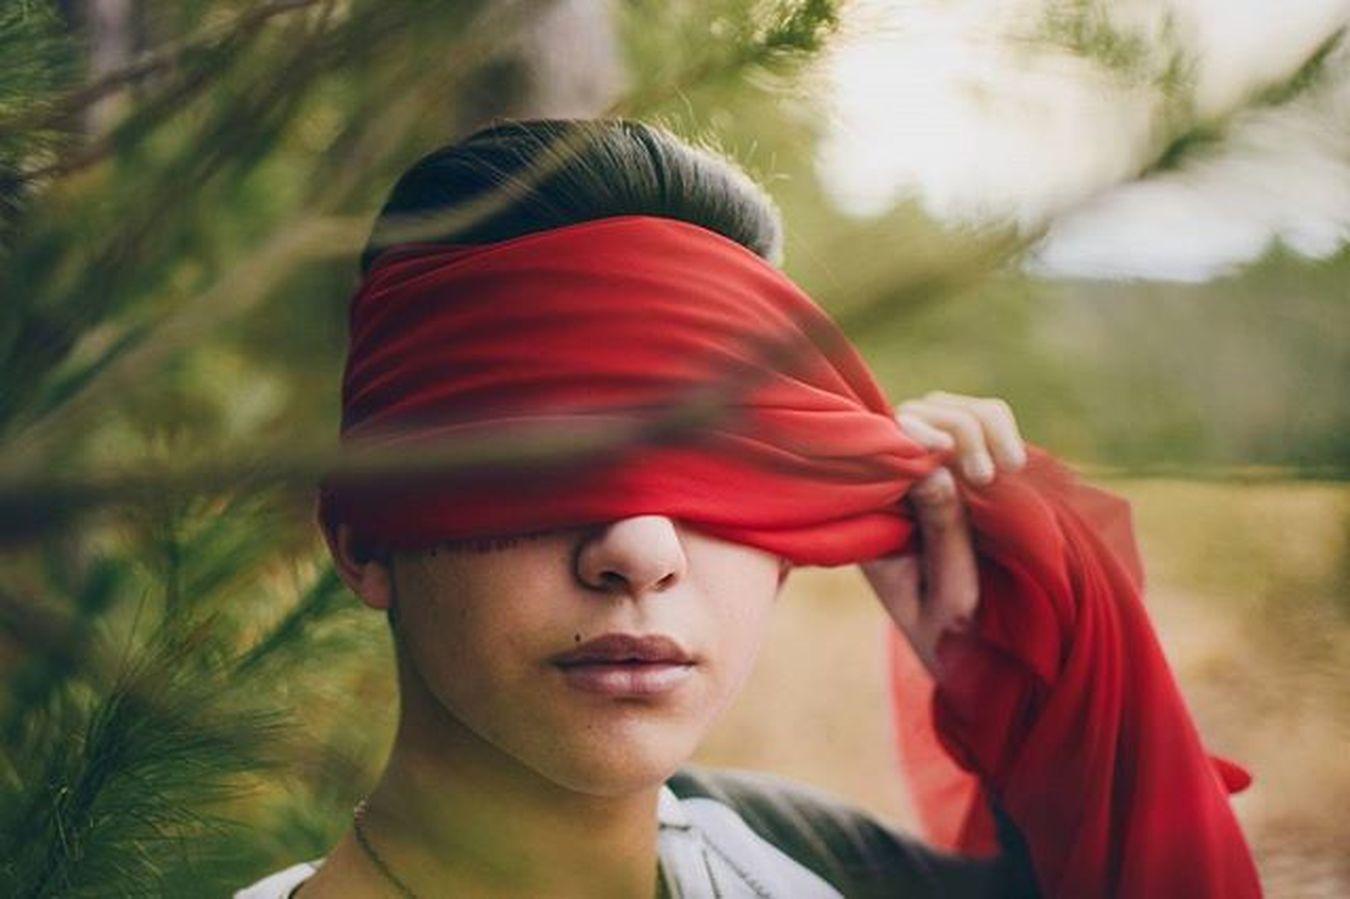 Blind. ❌ Scarlett Red Silk Blind Linen Colors Green Woods Forest Trees Pines Valley Orchard Blinded Iseered VSCO Vscocam Vscovisuals Vscogrid Vscofilm Vscored Nikond5300 Face Fashion Style seeconceptualconceptualphotography